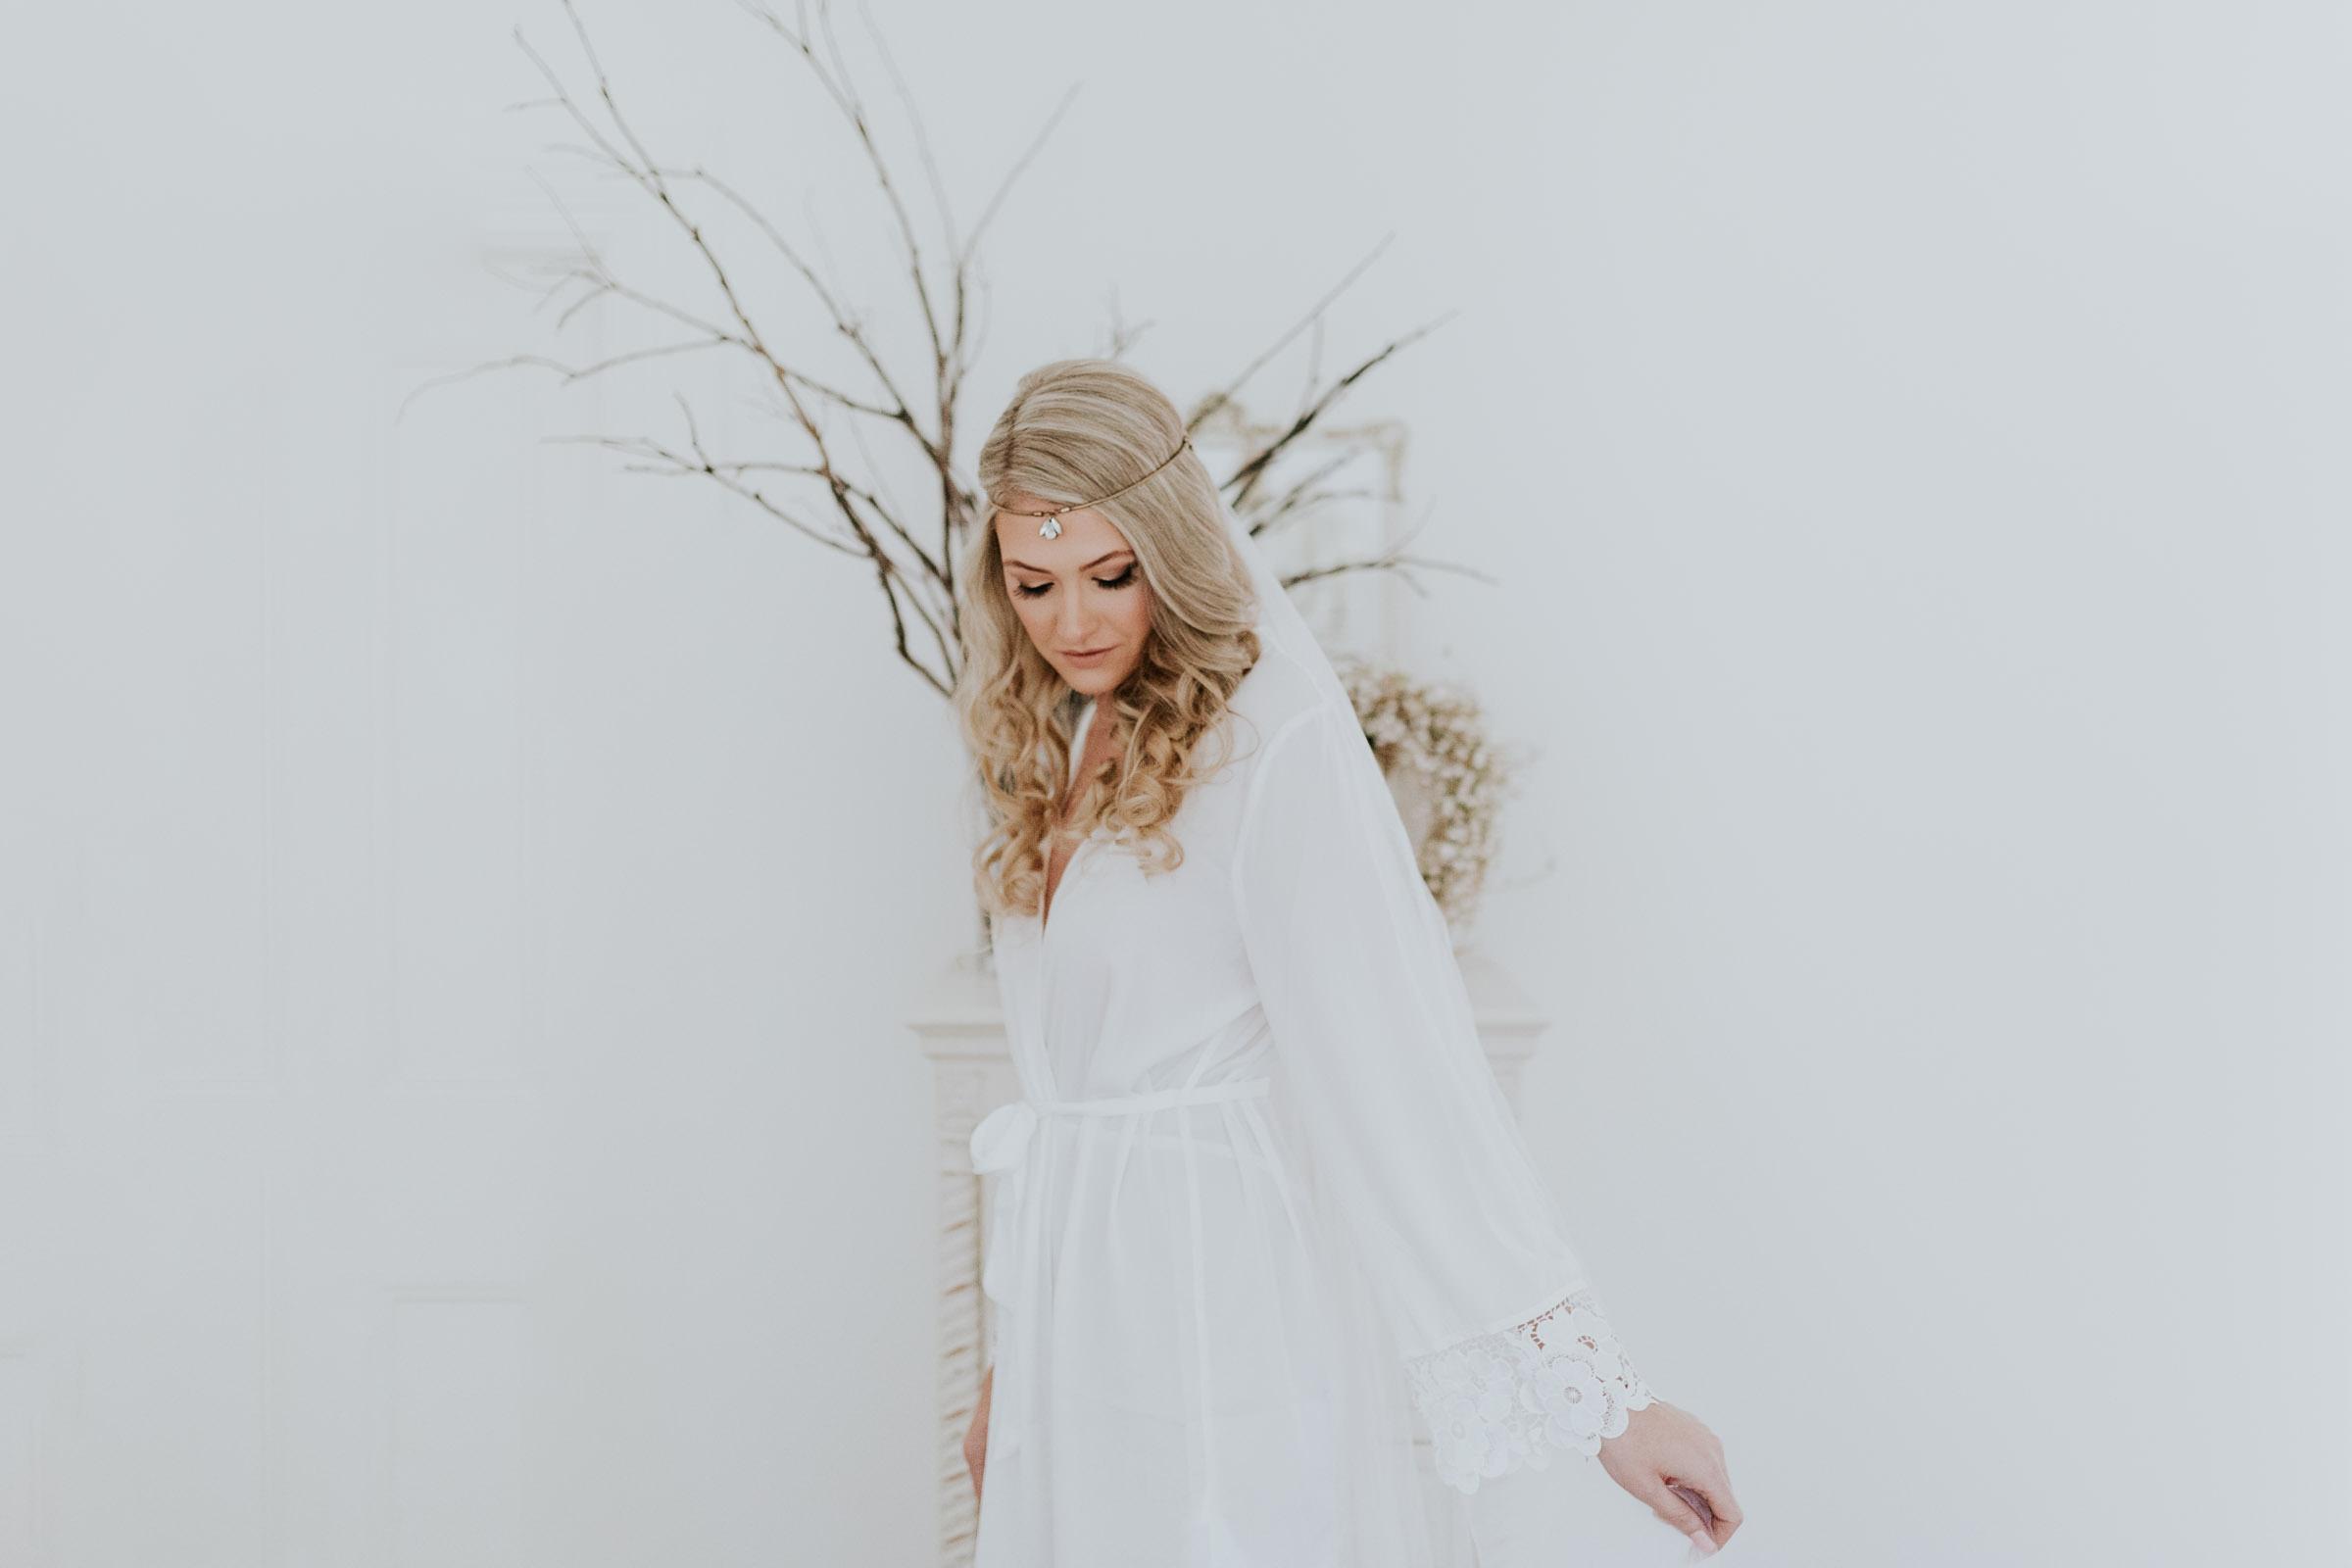 Emma+John+Far+South+Coast+Wedding+Festivl+Glamping+Bush-25.jpg